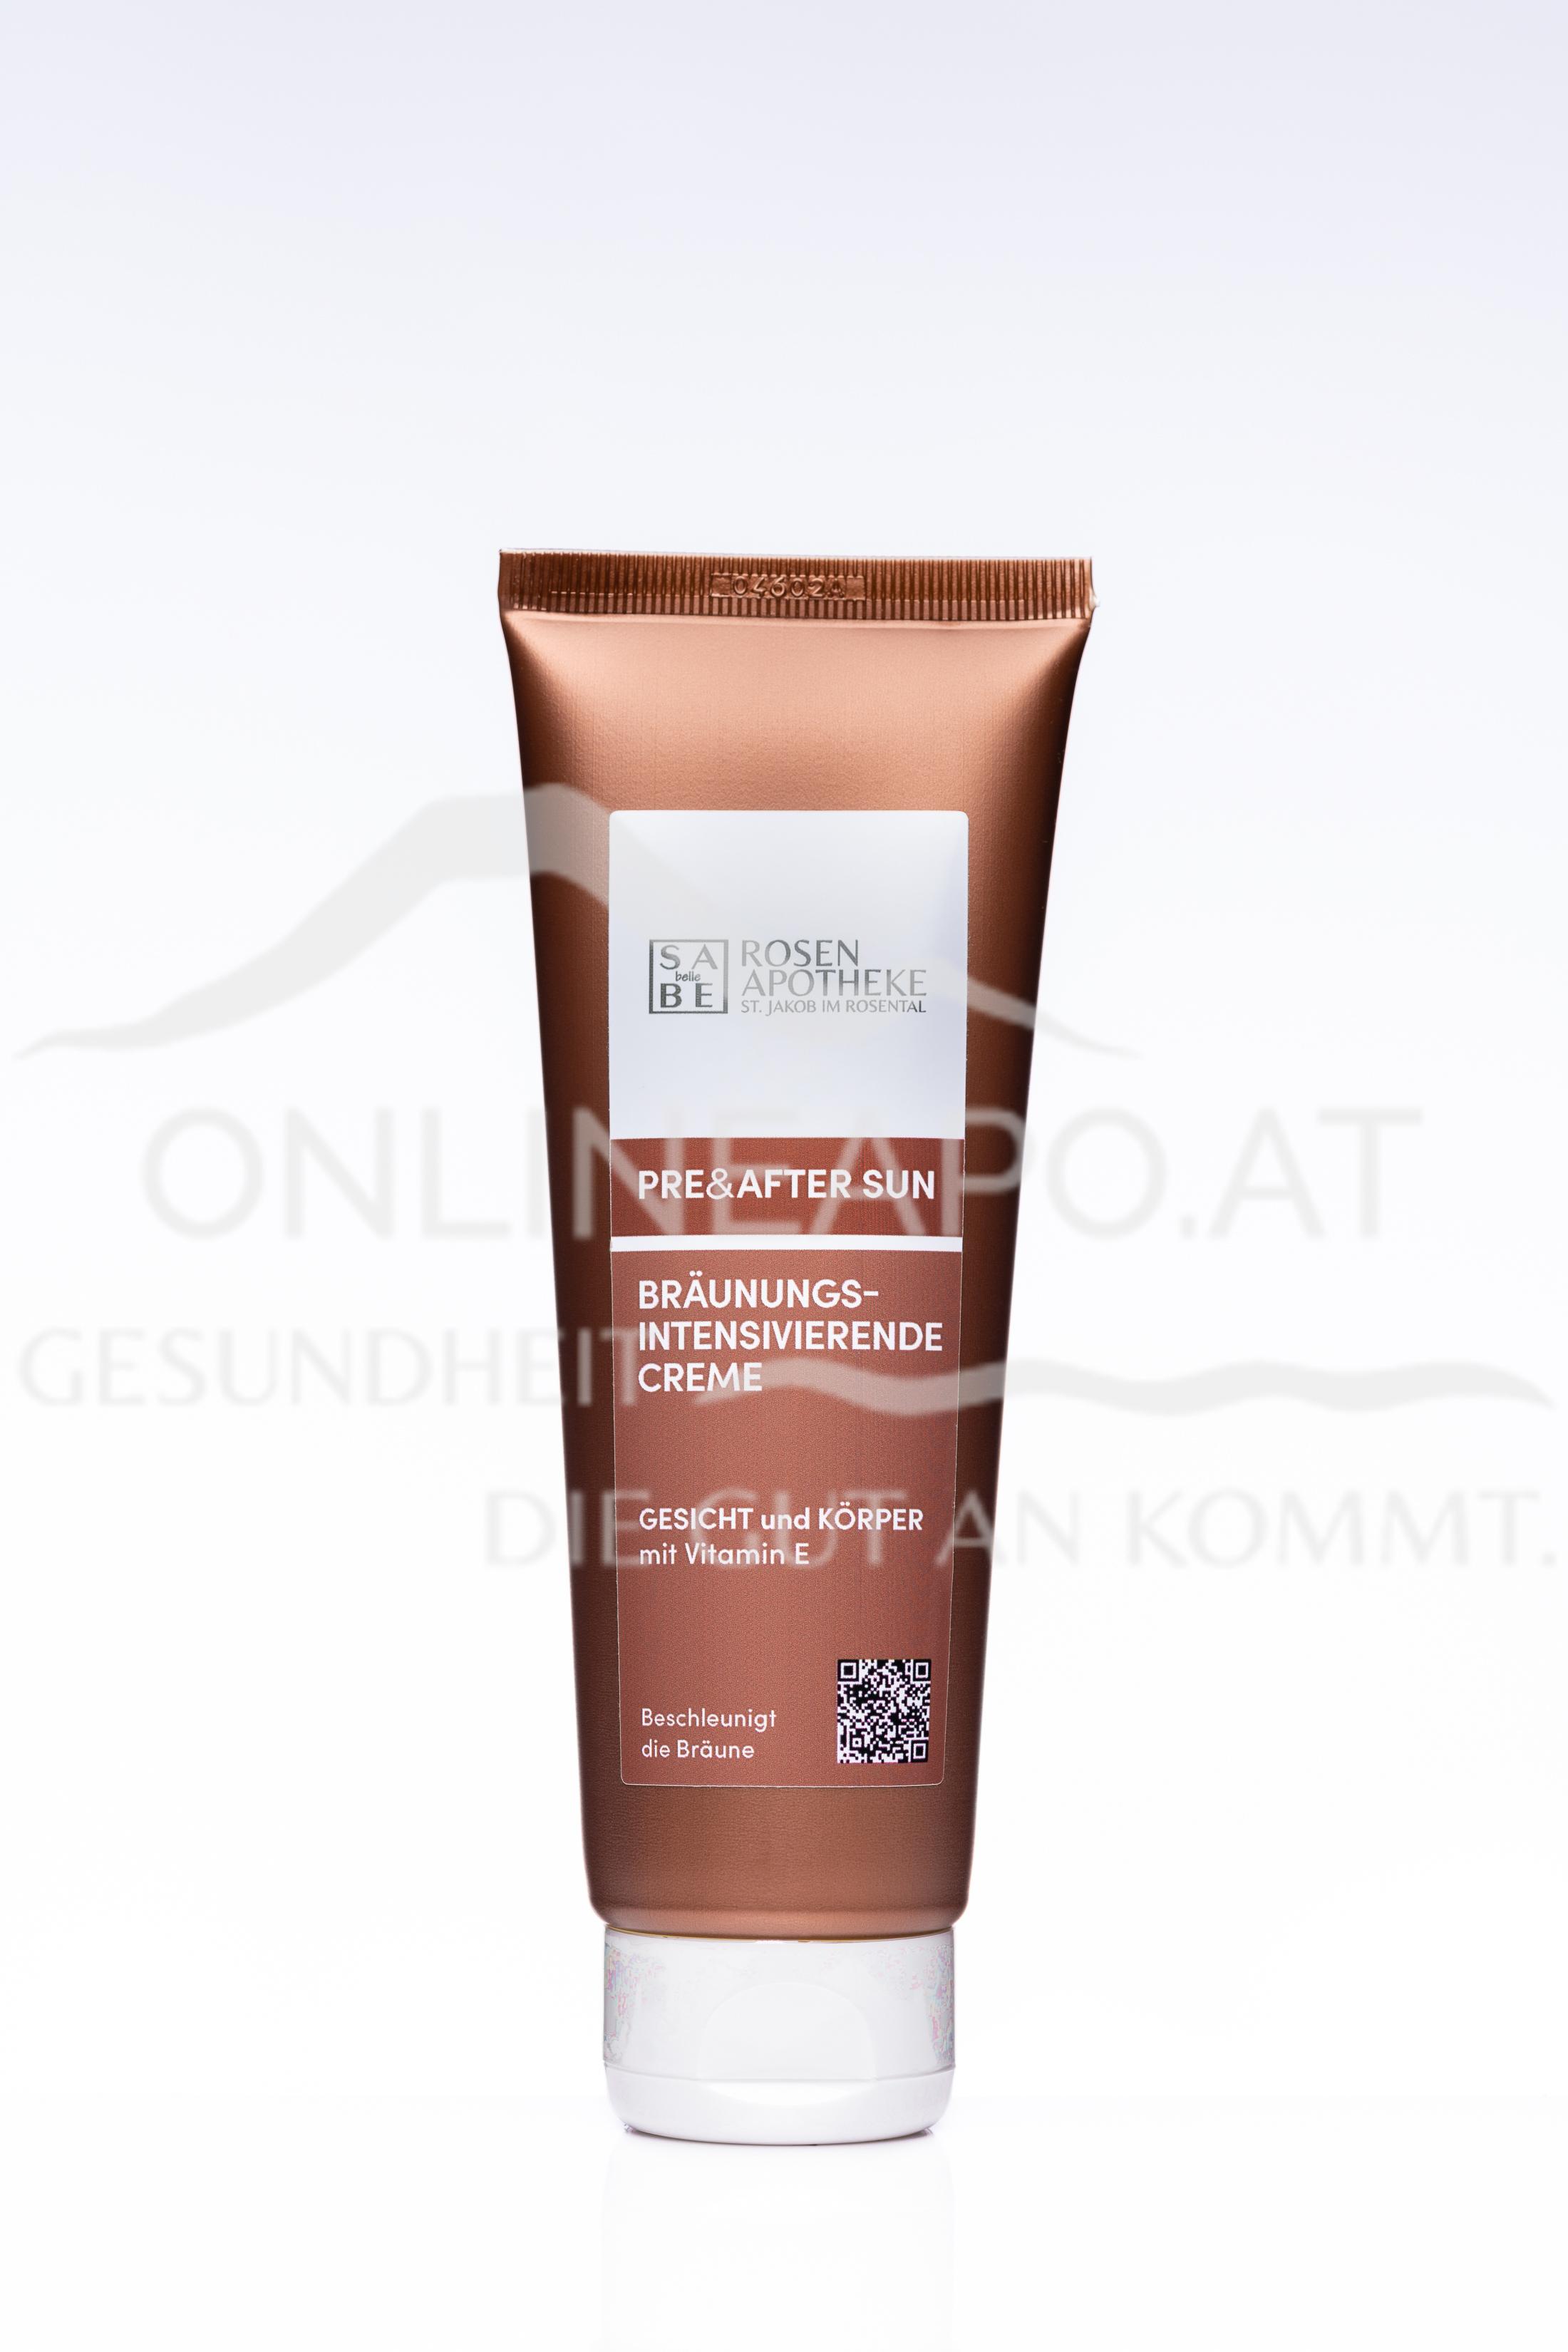 SABE belle Bräunungsintensivierende Creme Pre & After Sun